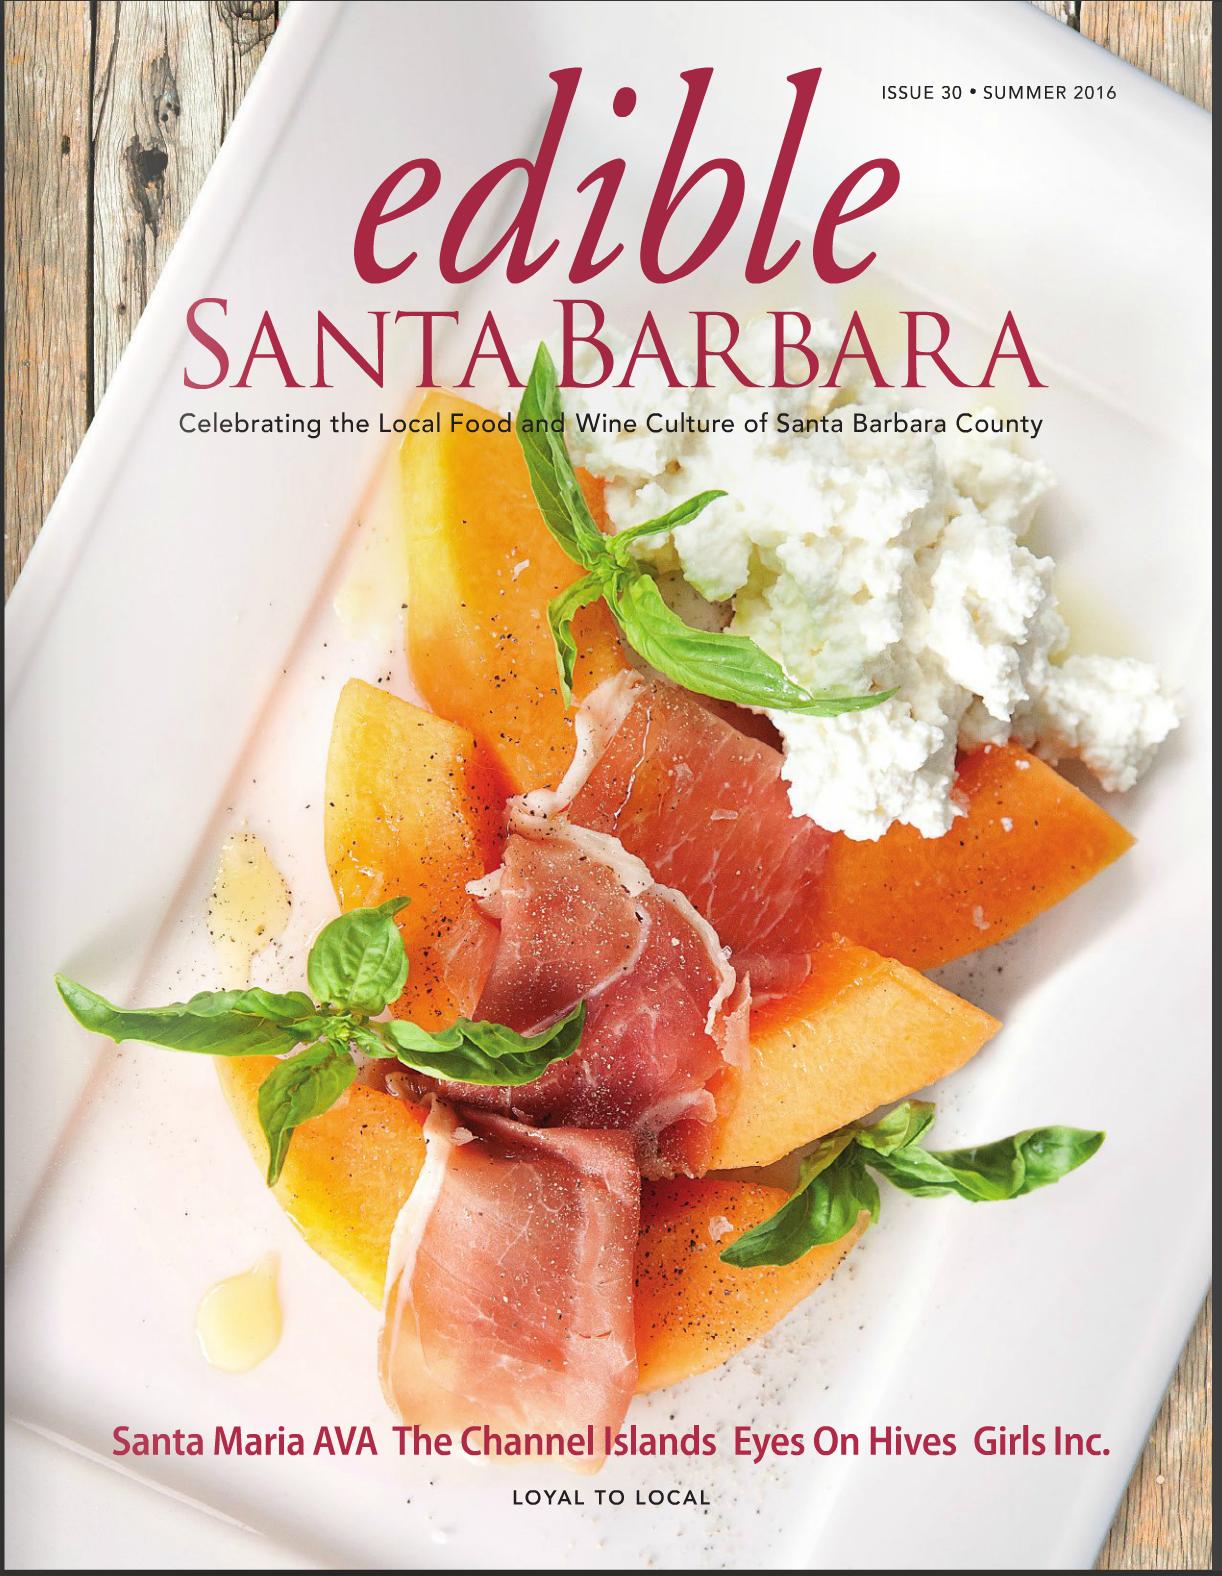 Santa Barbara Channel Islands - Bylines on pages 12, 13, 51